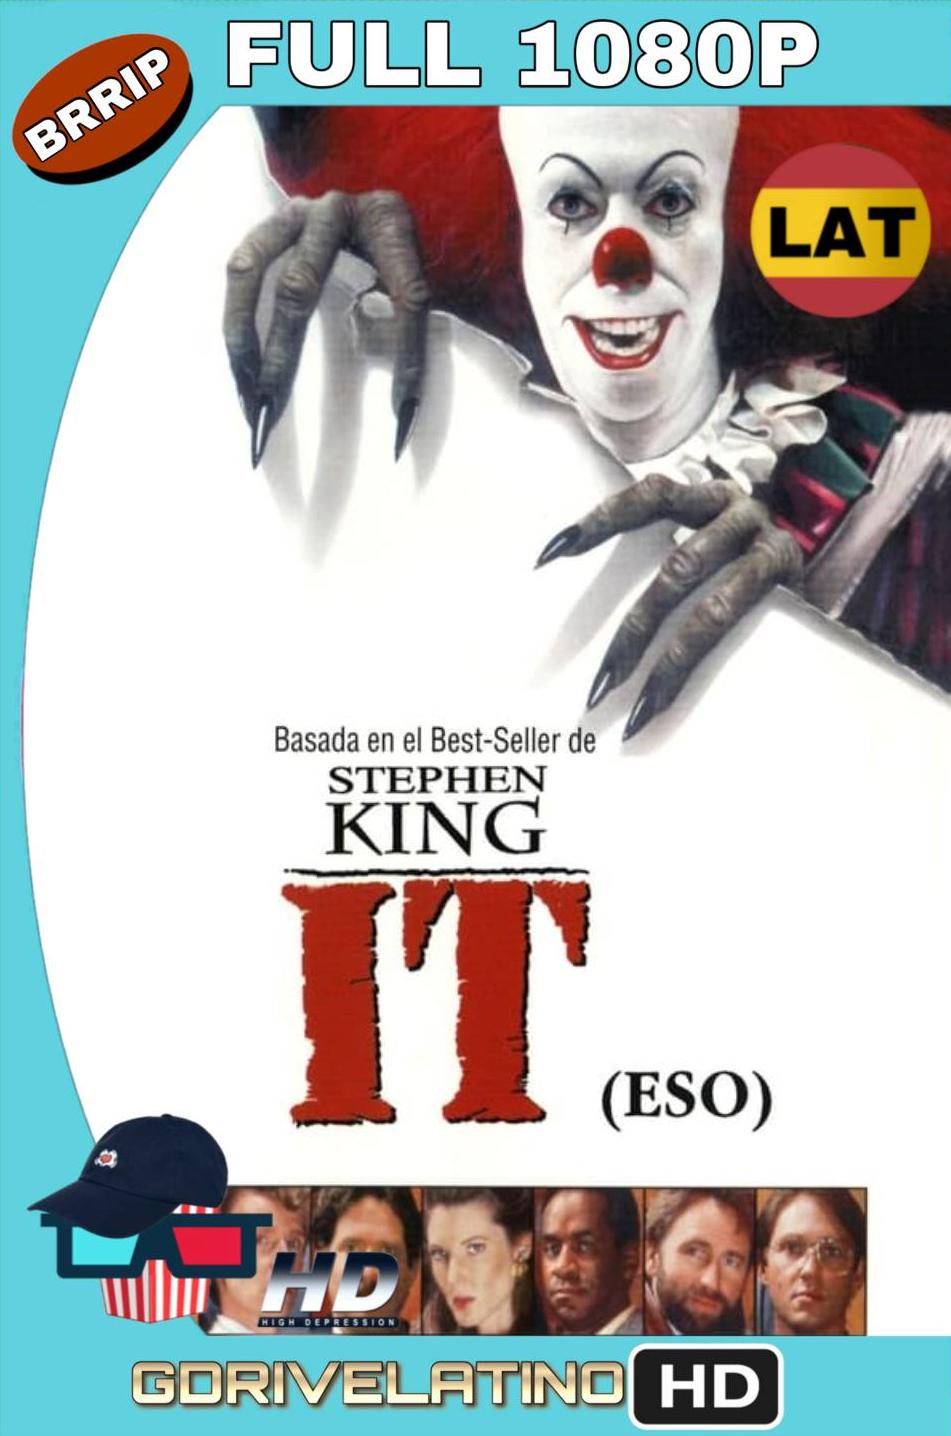 It (Eso) Stephen King (1990) BRRip FULL 1080p Latino MKV